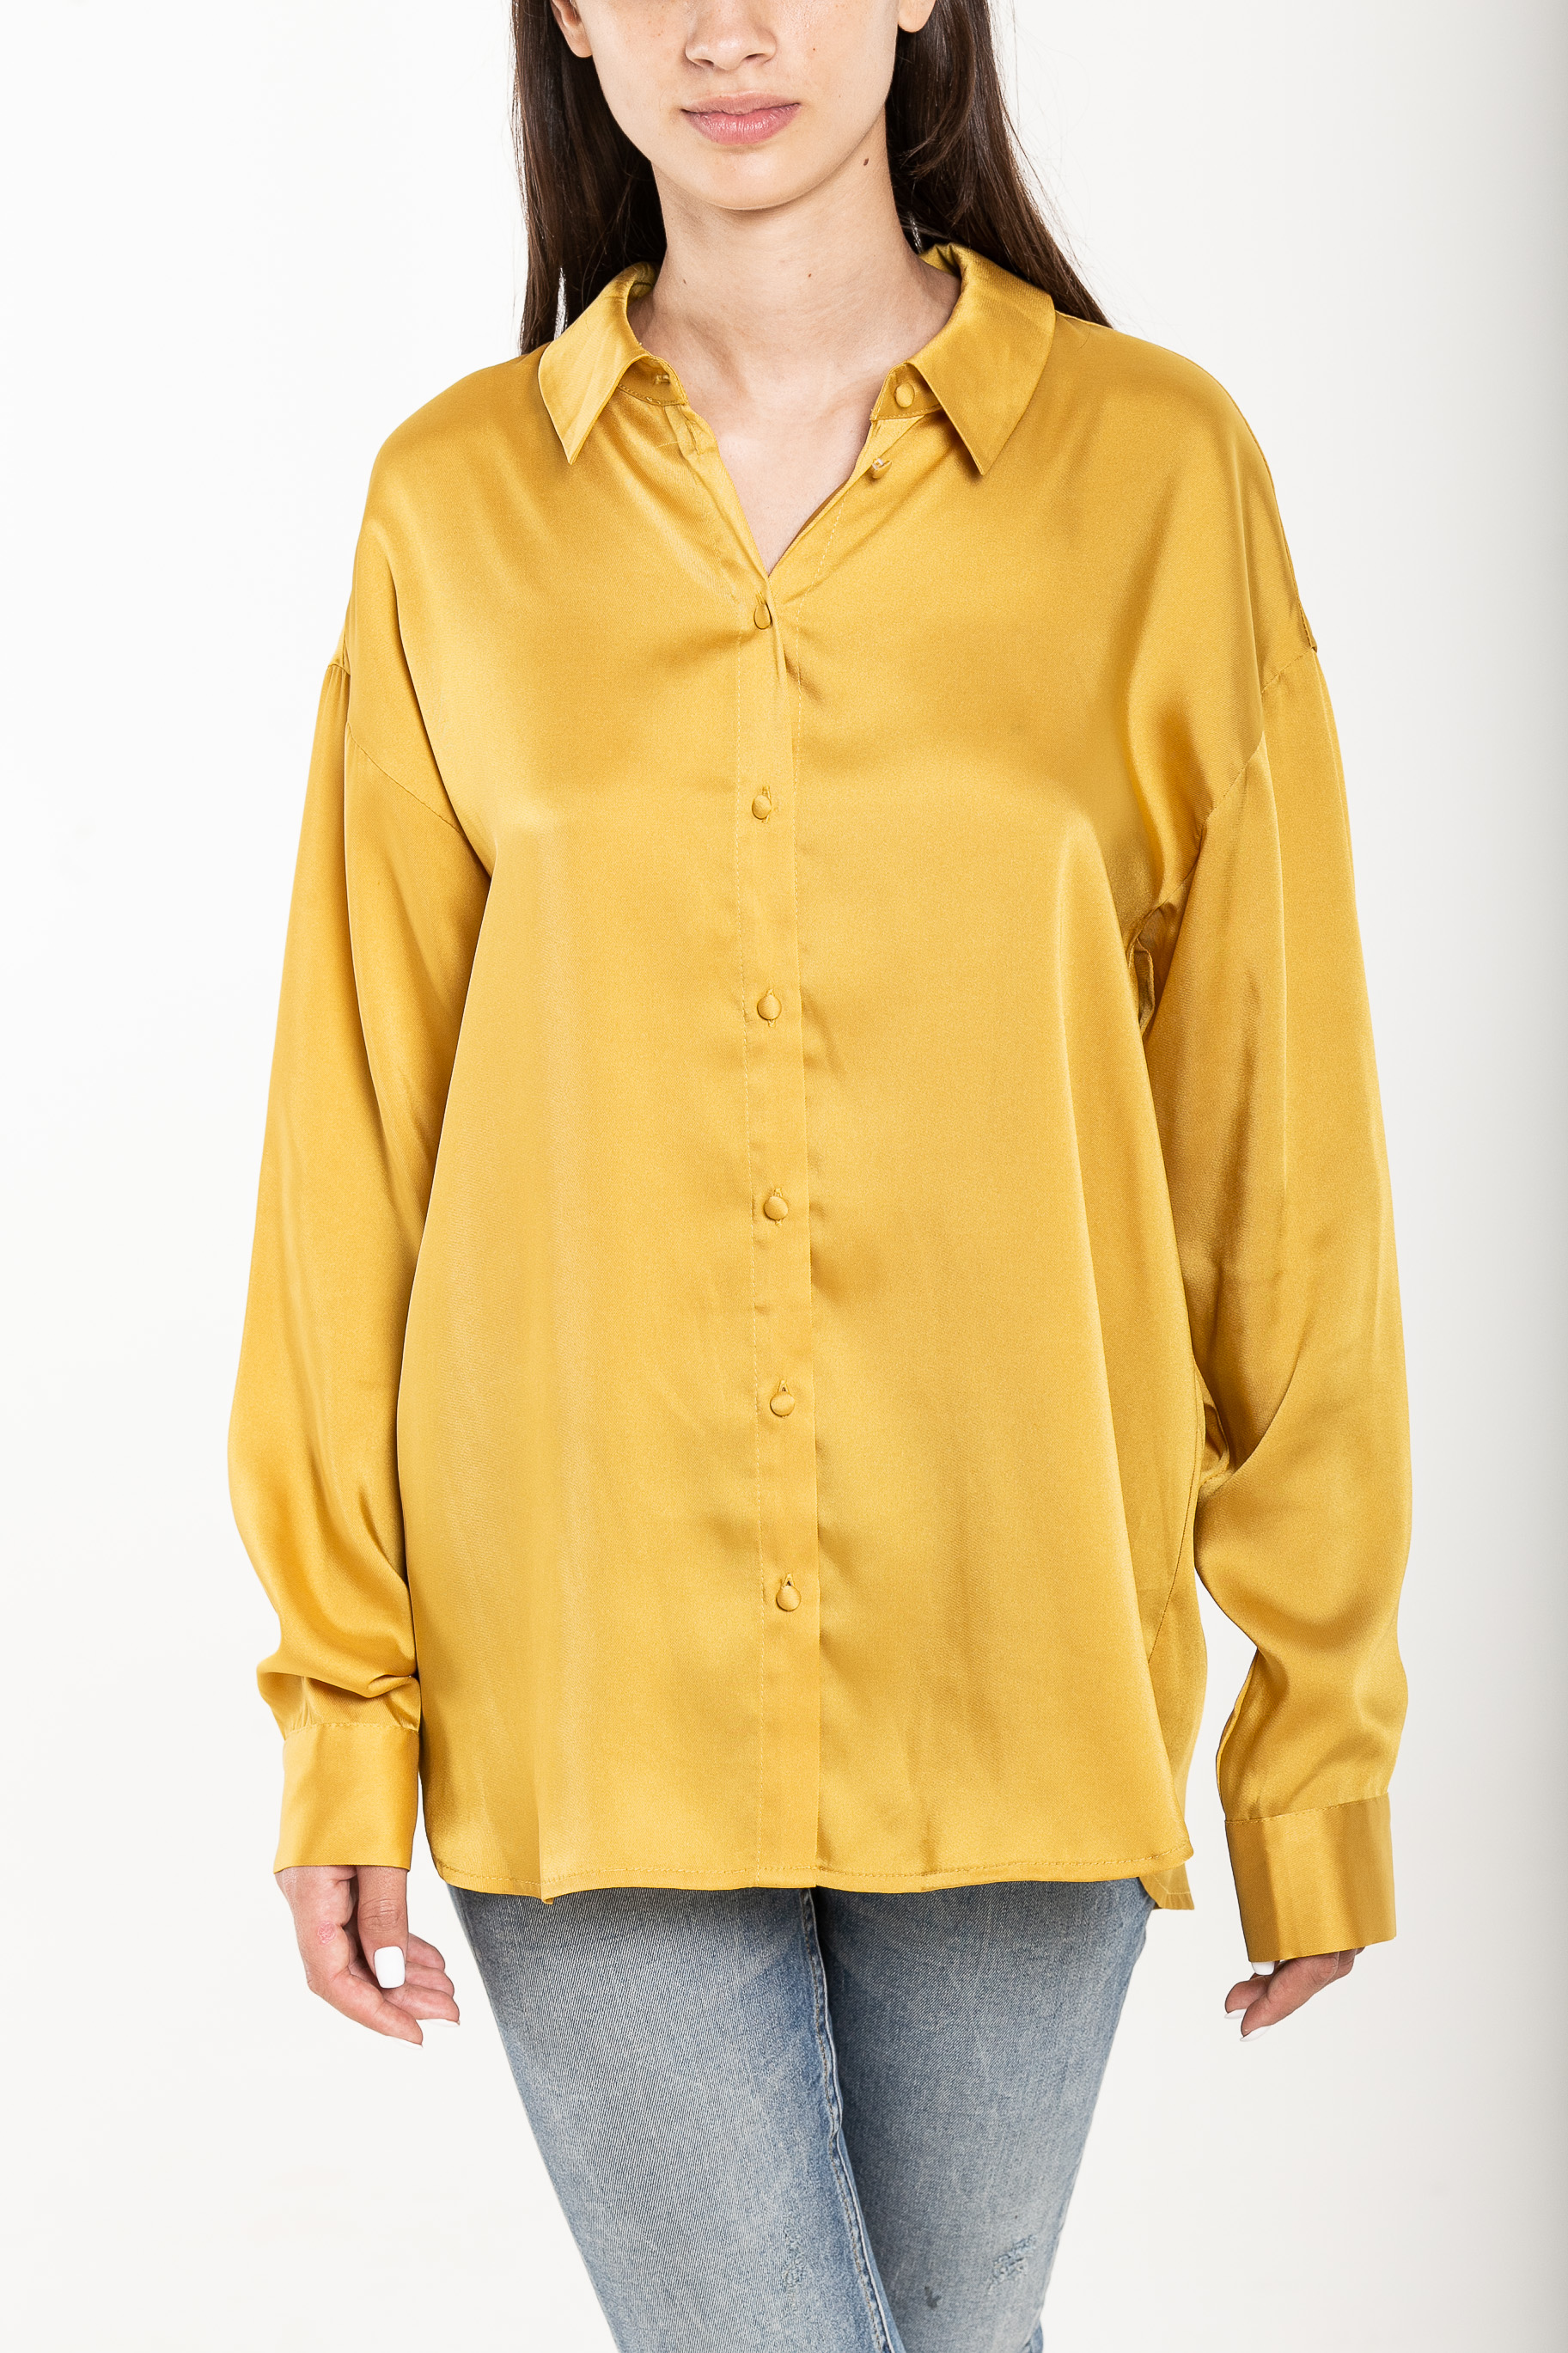 Блузка Vero Moda Casual (1322) photo